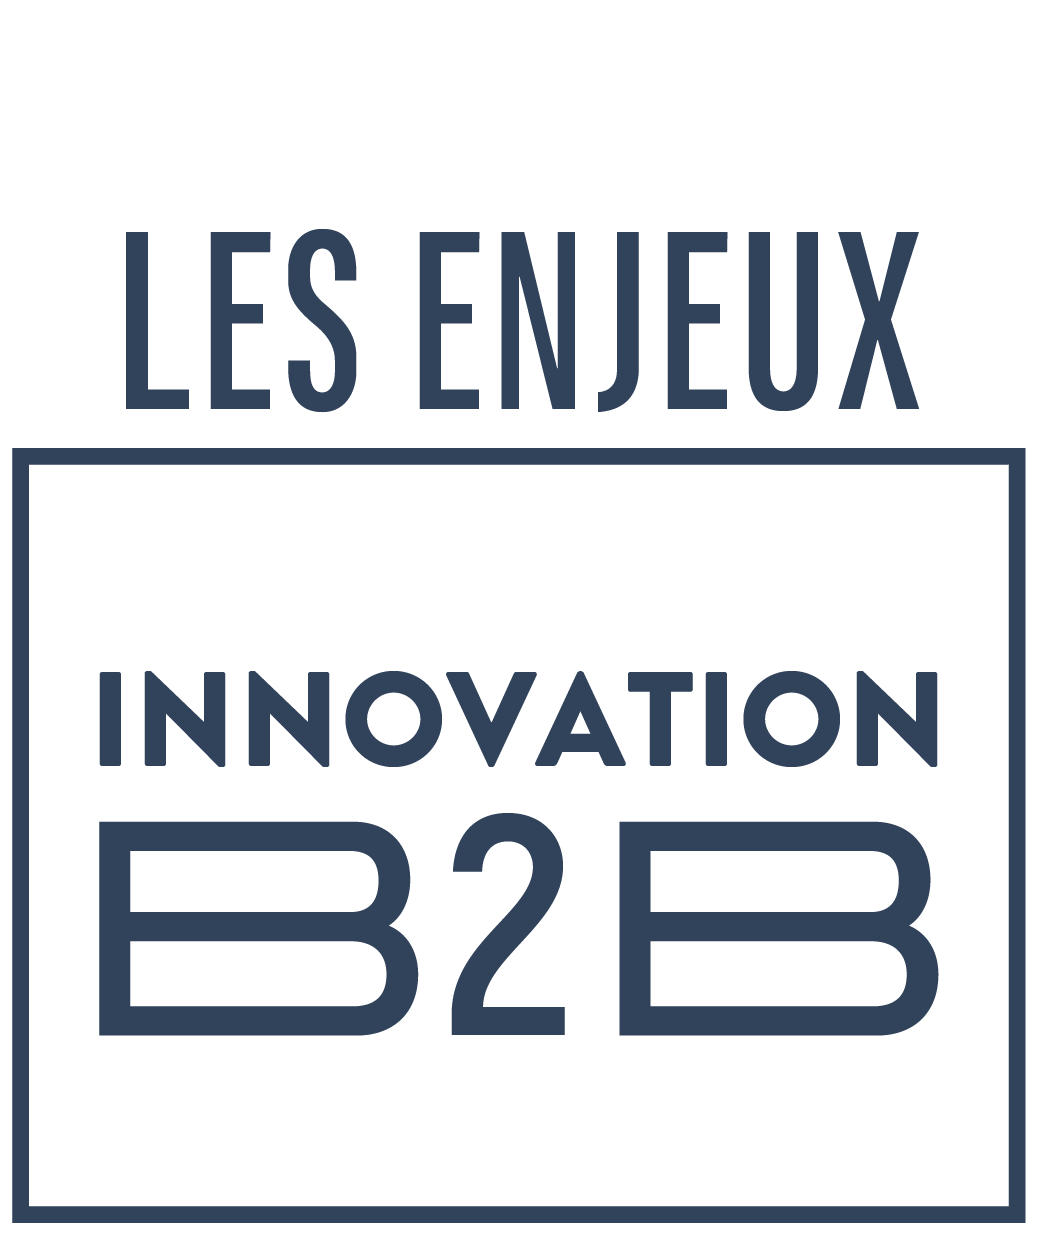 innov_b2b_logo-13